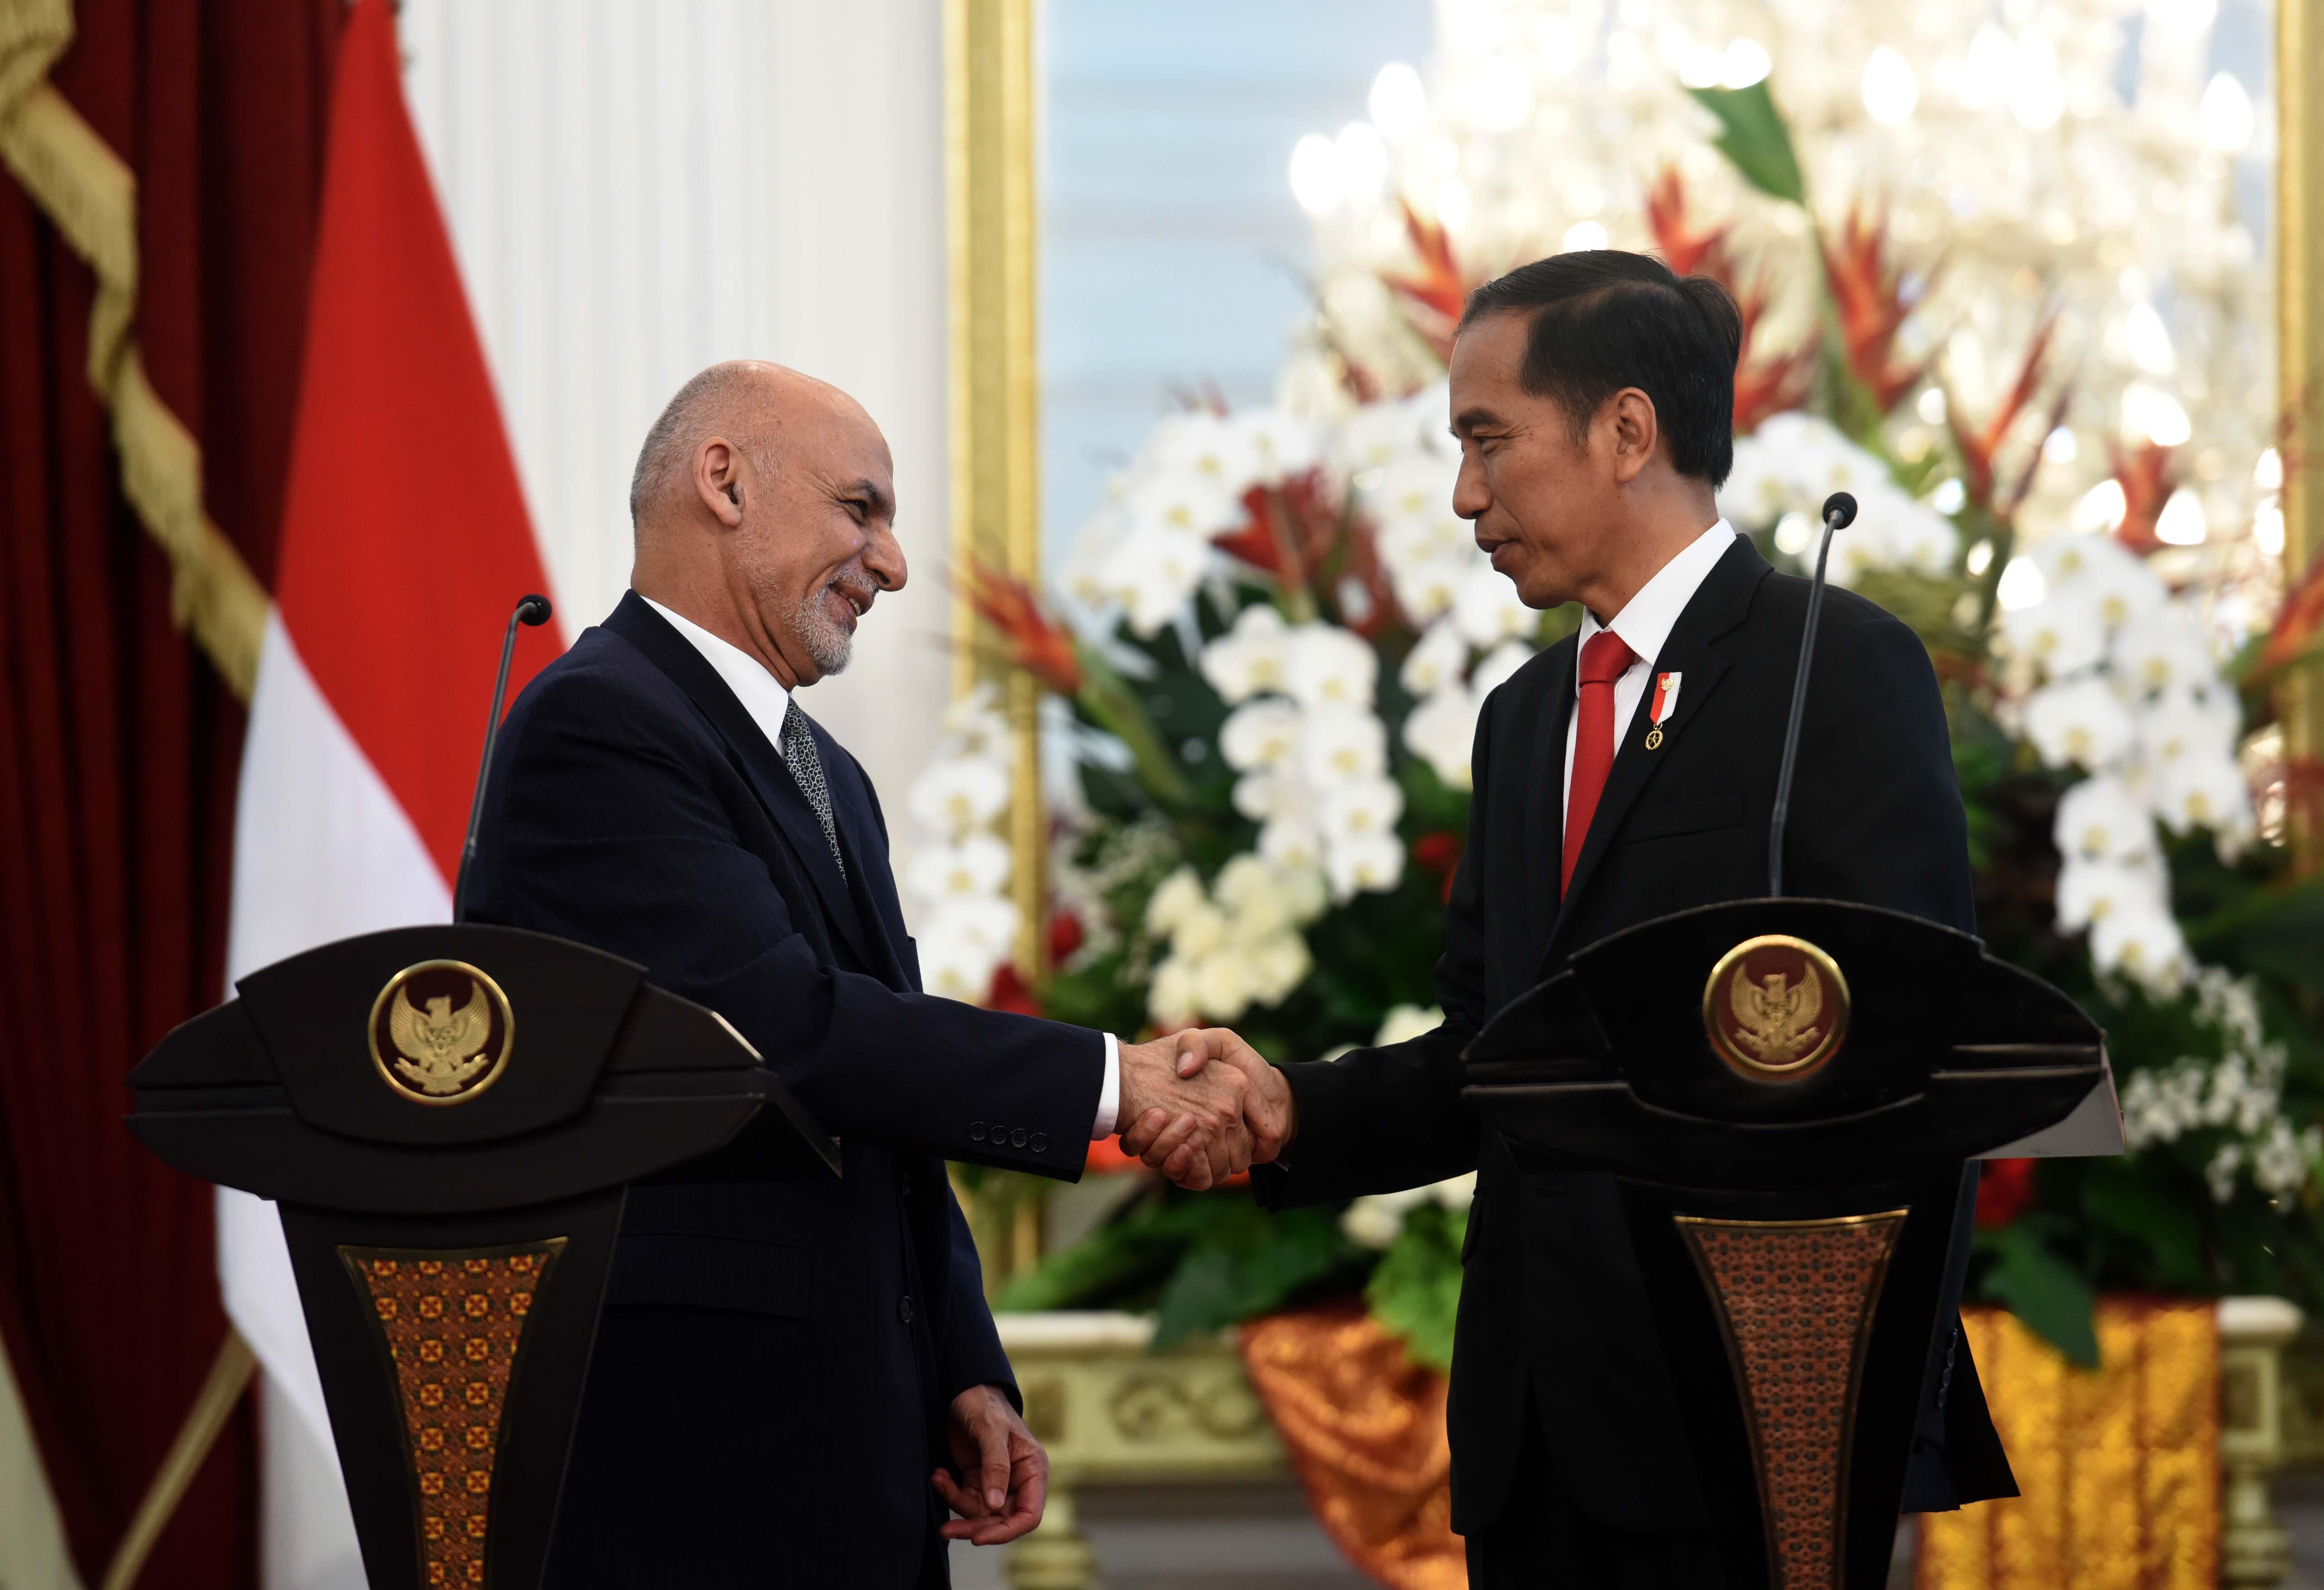 Presiden Jokowi bersalaman dengan Presiden Afghanistan Mohammad Ashraf Ghani, usai melakukan konperensi pers bersama, di Istana Merdeka, Jakarta, Rabu (5/4) sore. (Foto: JAY/Humas)